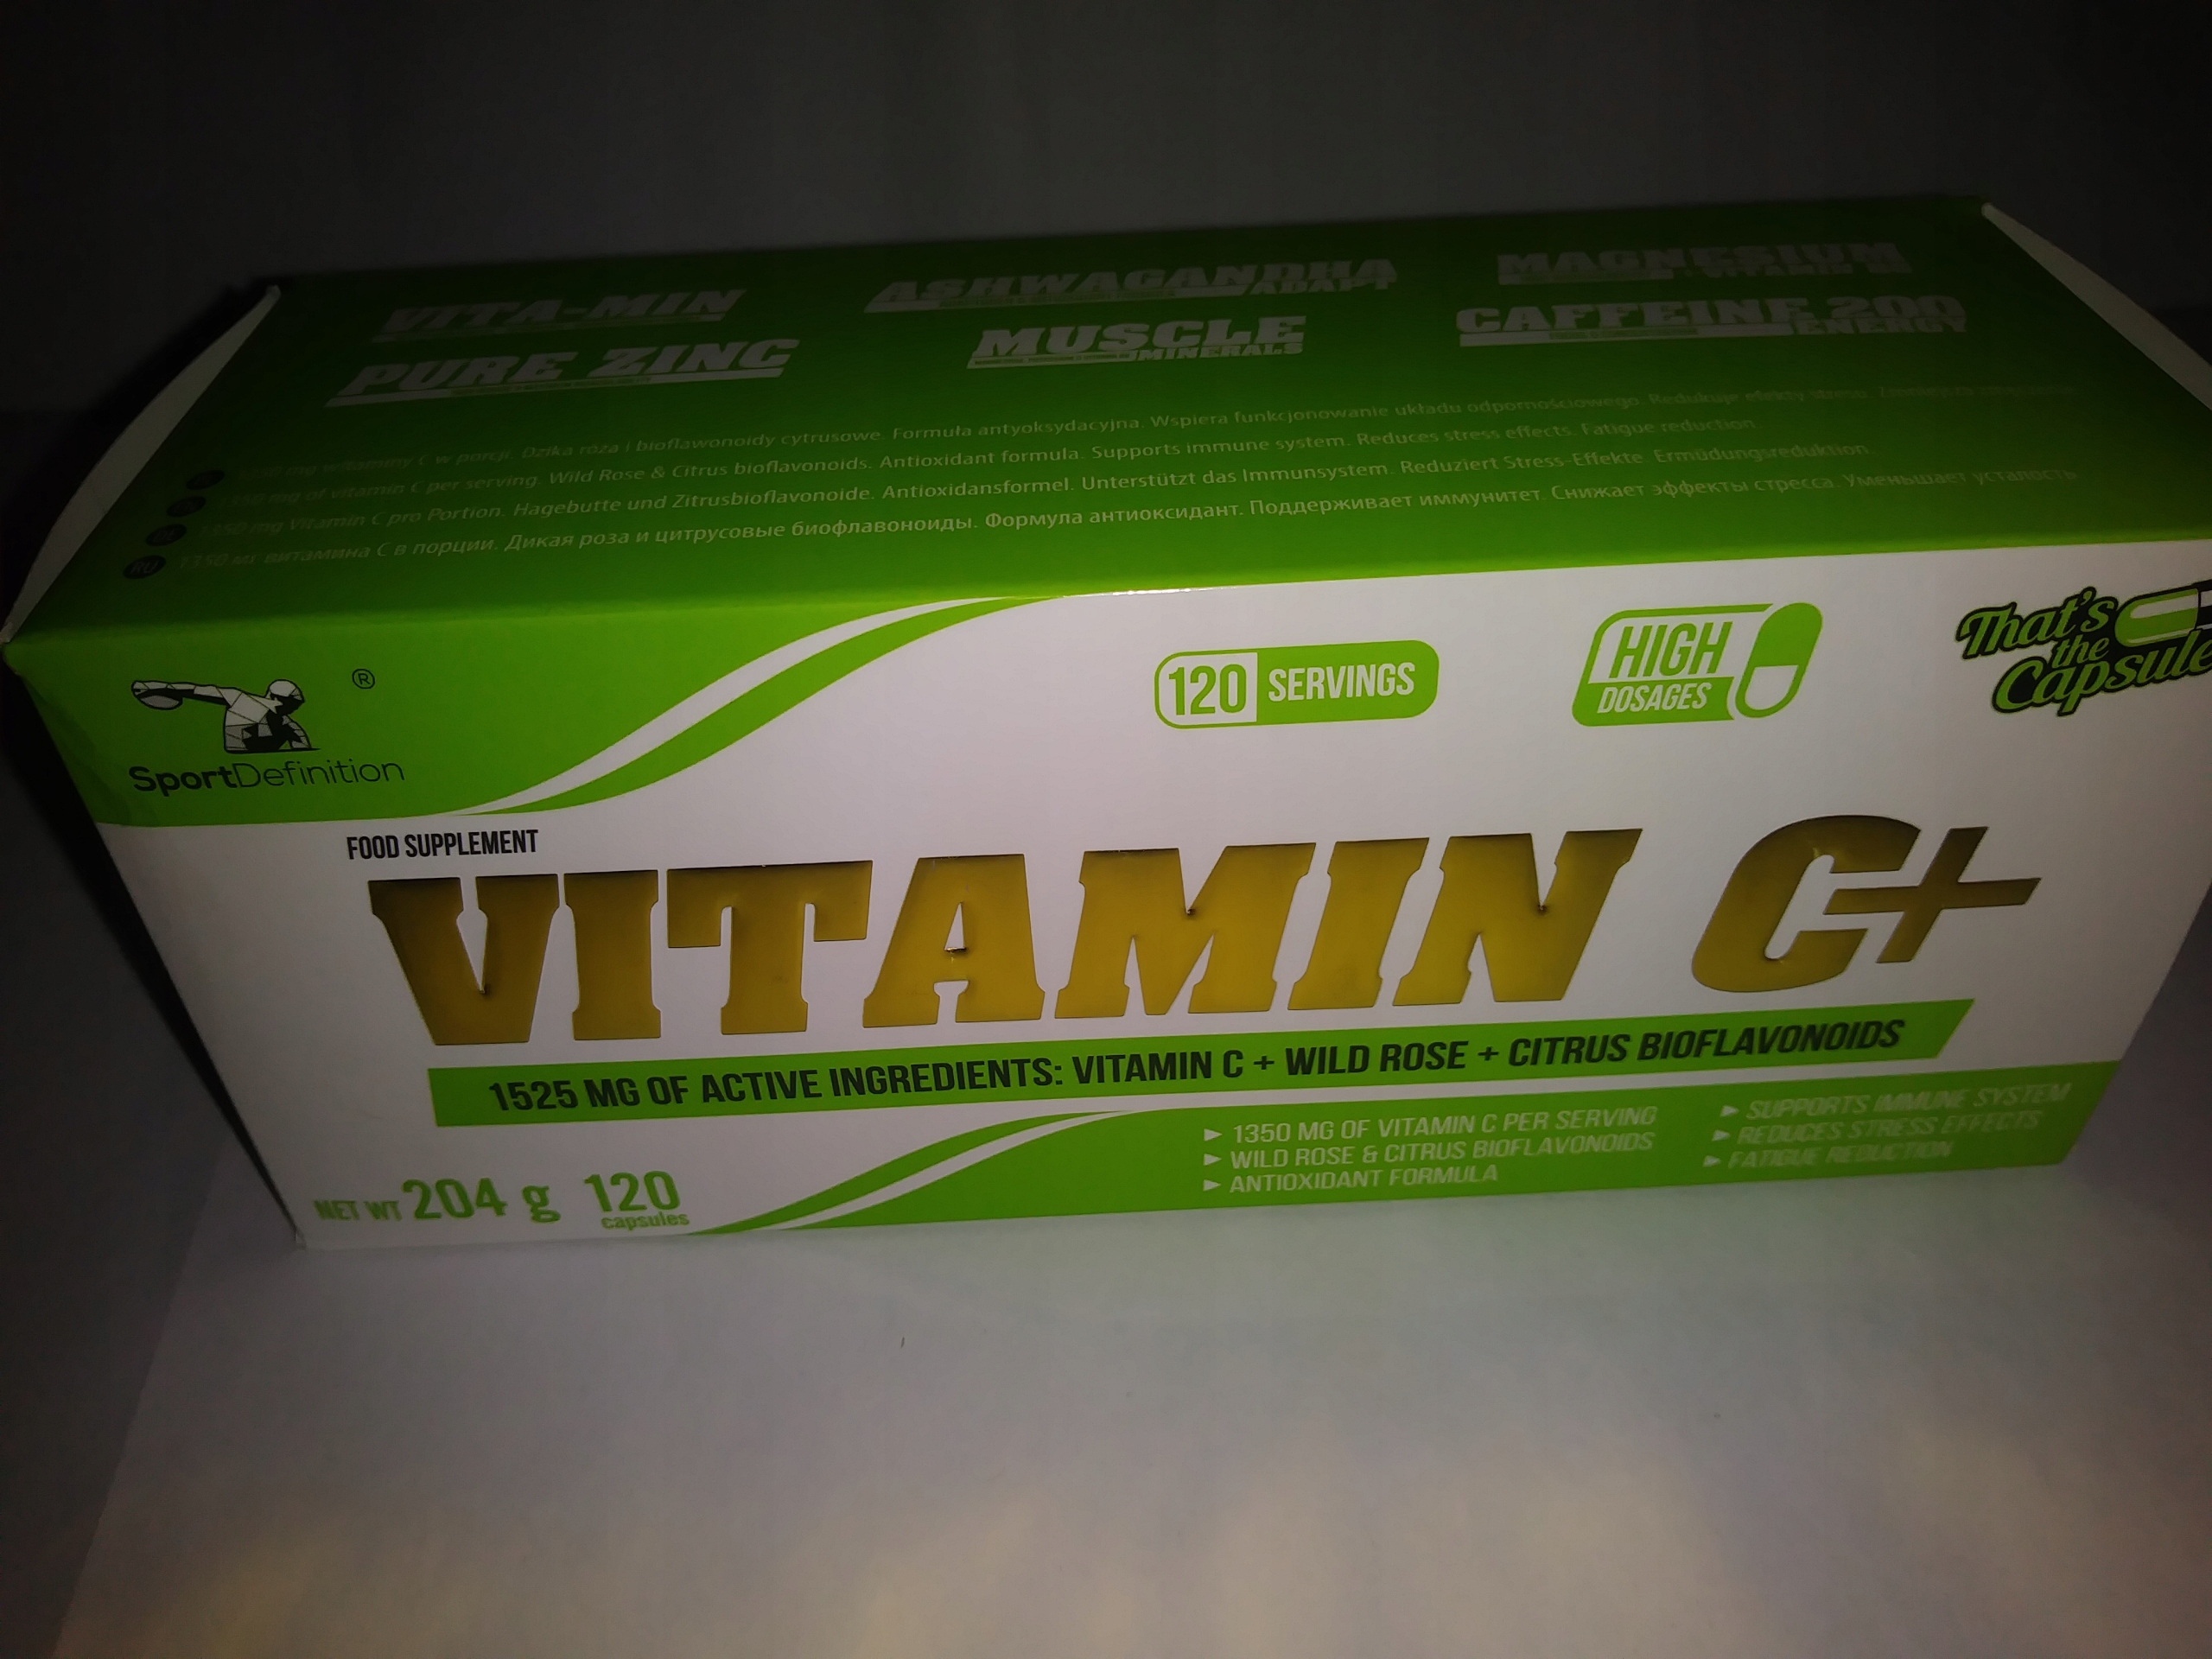 Vitamin C+ SportDefinition 1350mg (ODPORNOŚĆ)